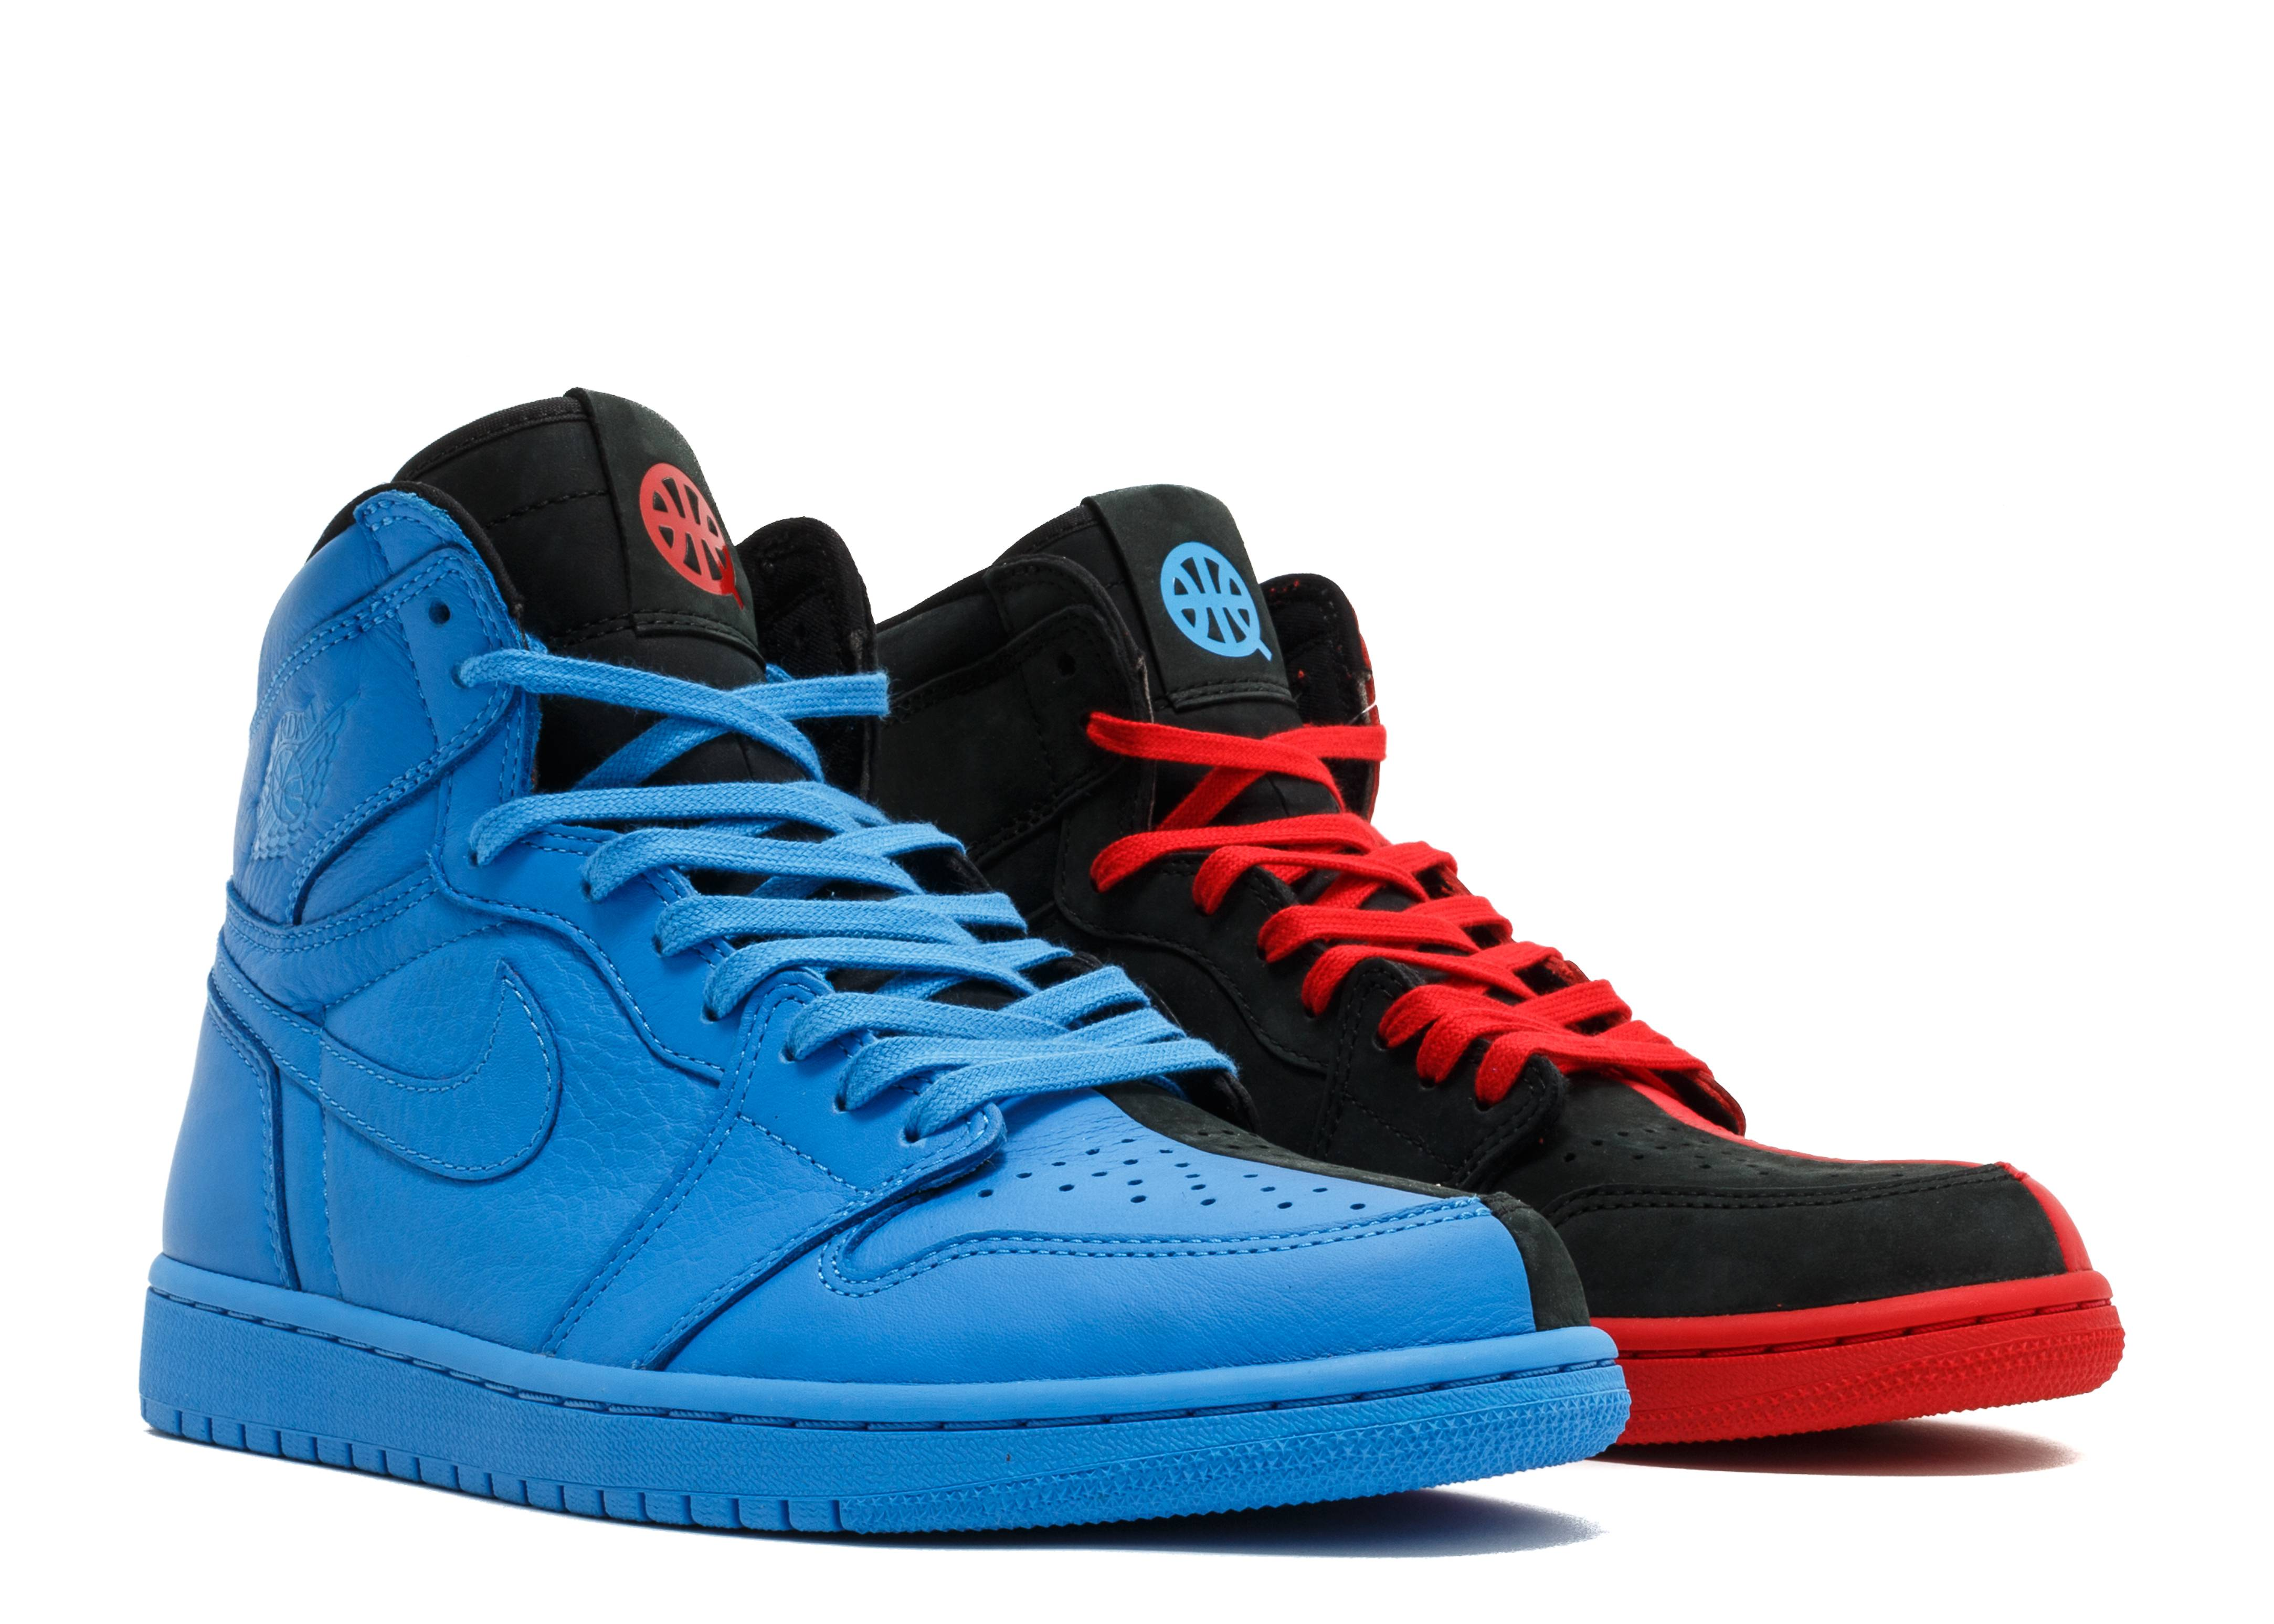 04691c1011c Air Jordan 1 Retro High